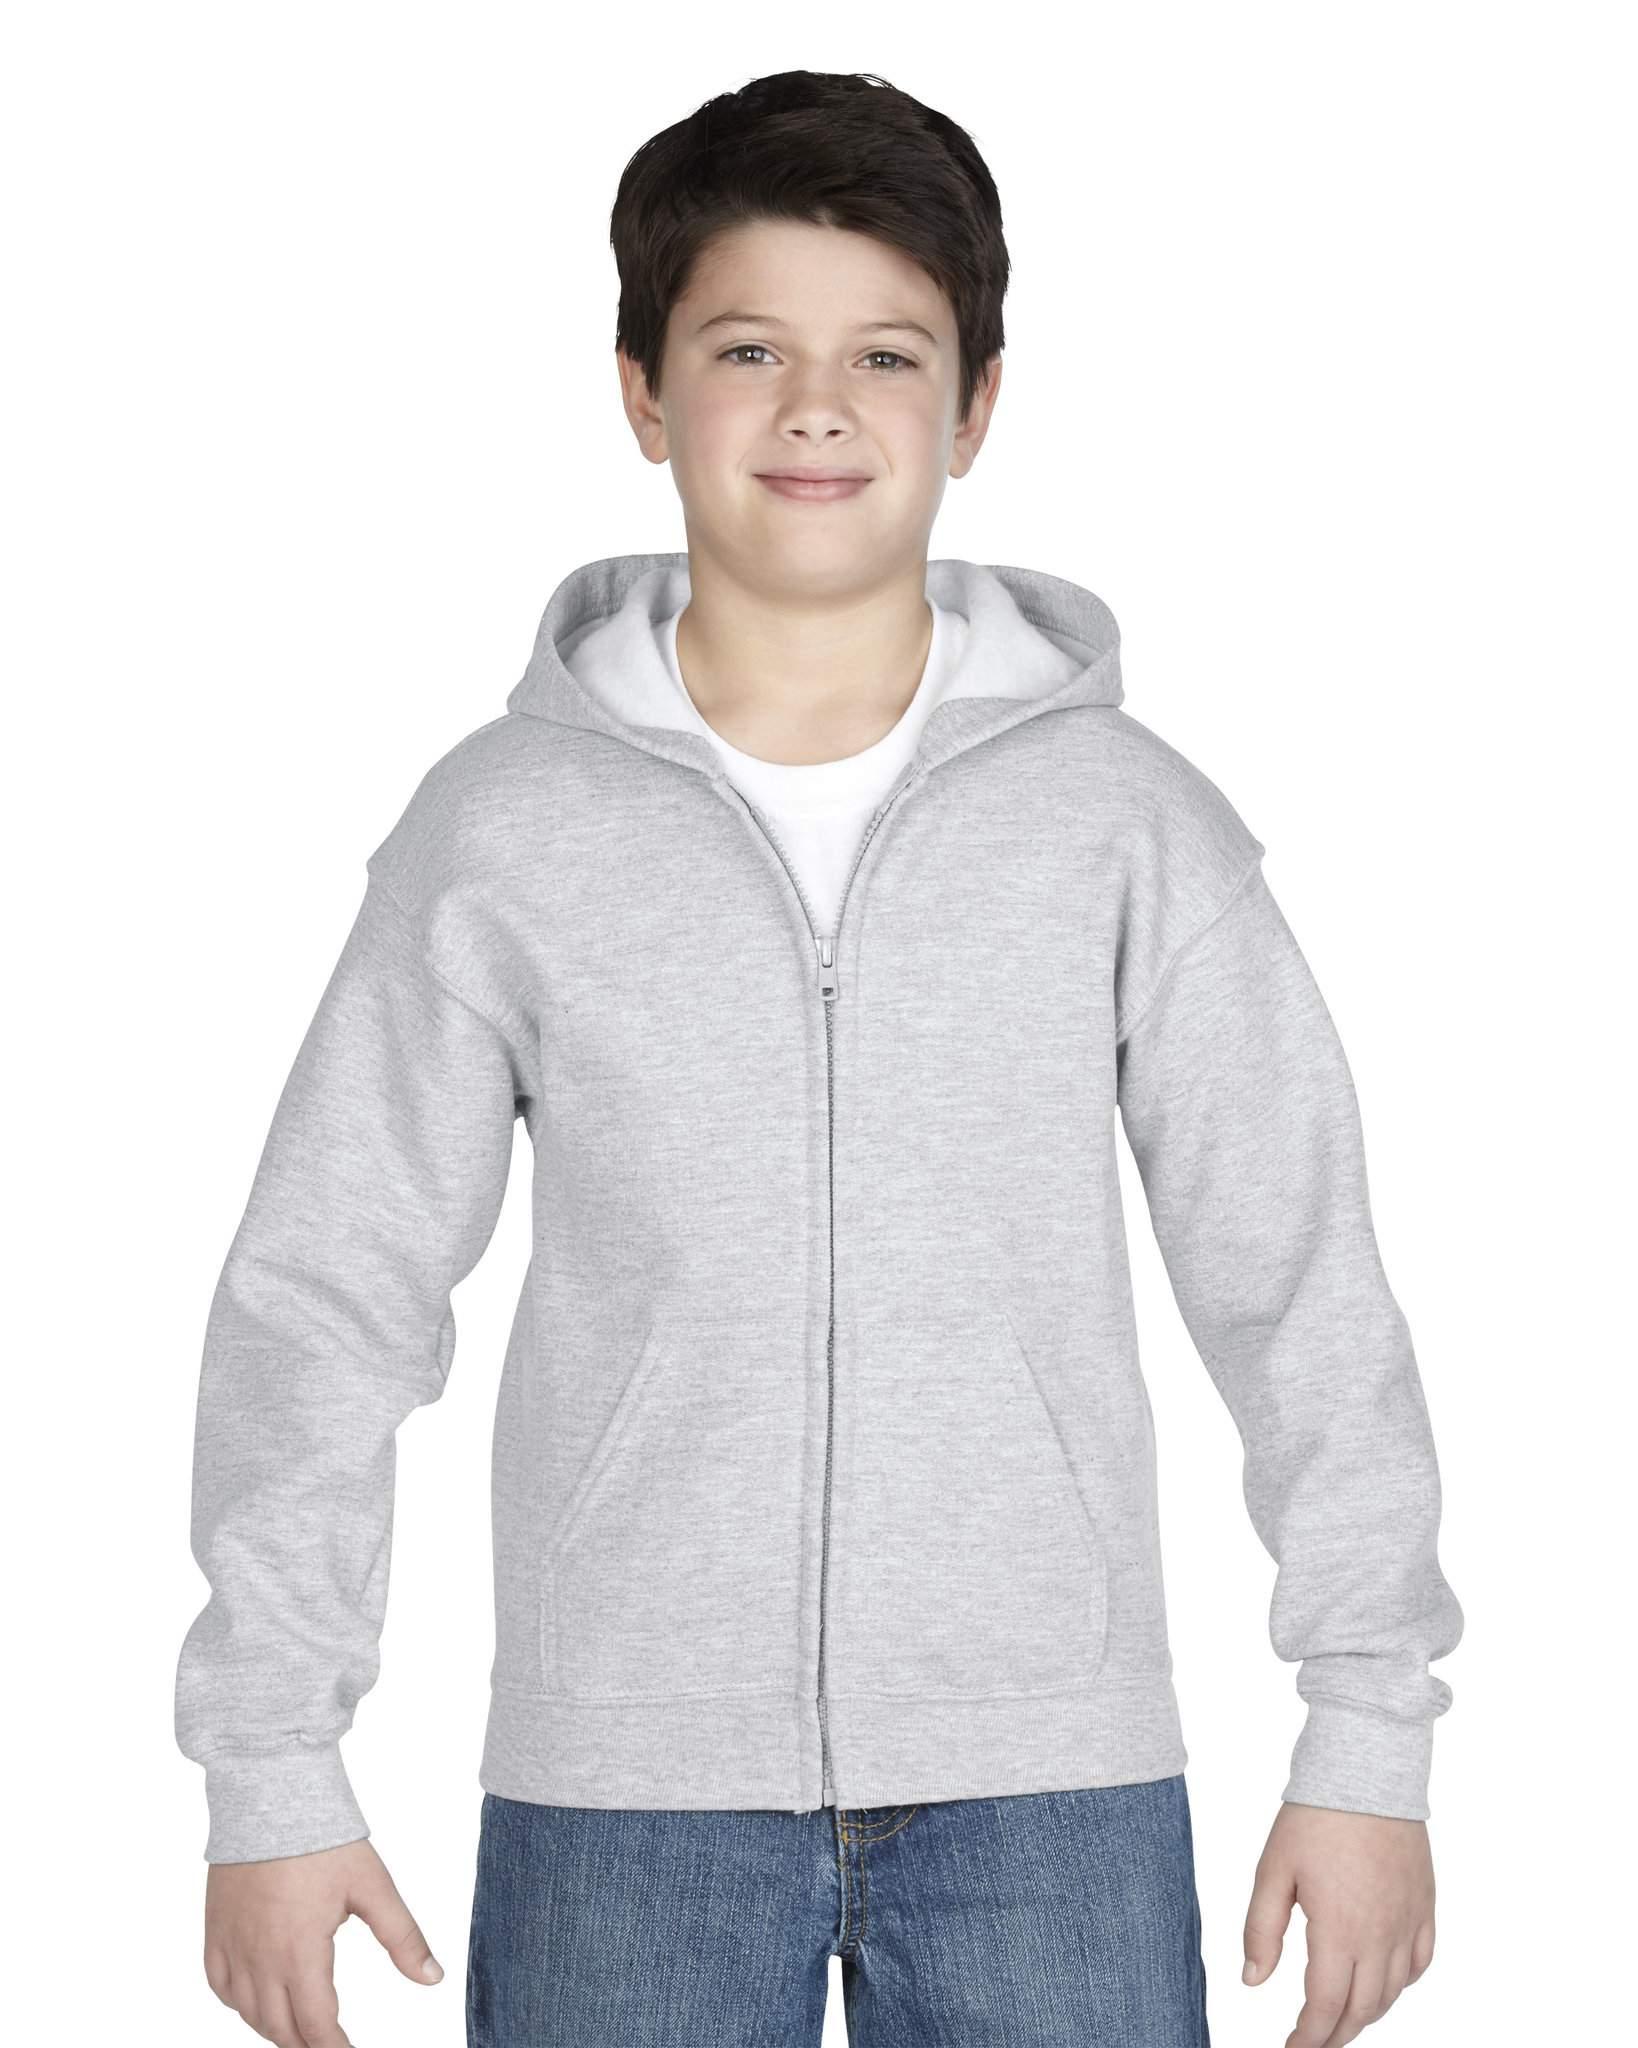 Sweatshirt personnalisable Full Hoody navy enfant - sweatshirt promotionnel